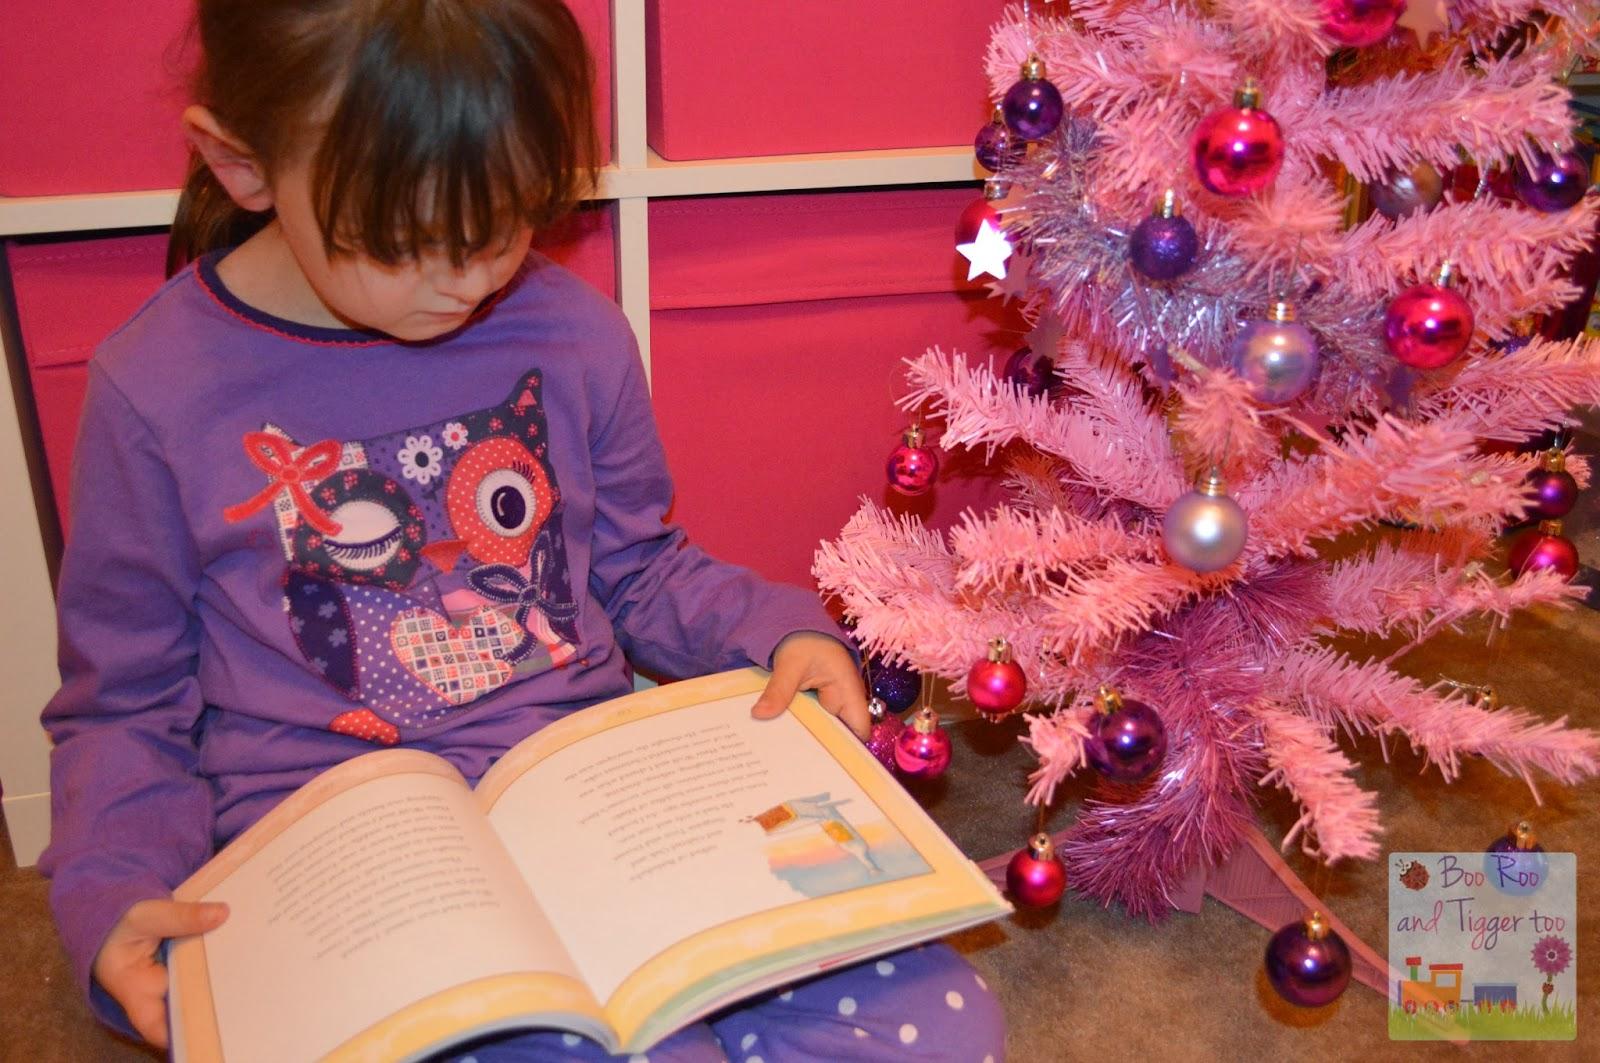 Boo Roo and Tigger Too: Michael Morpurgo Christmas Stories Book Review